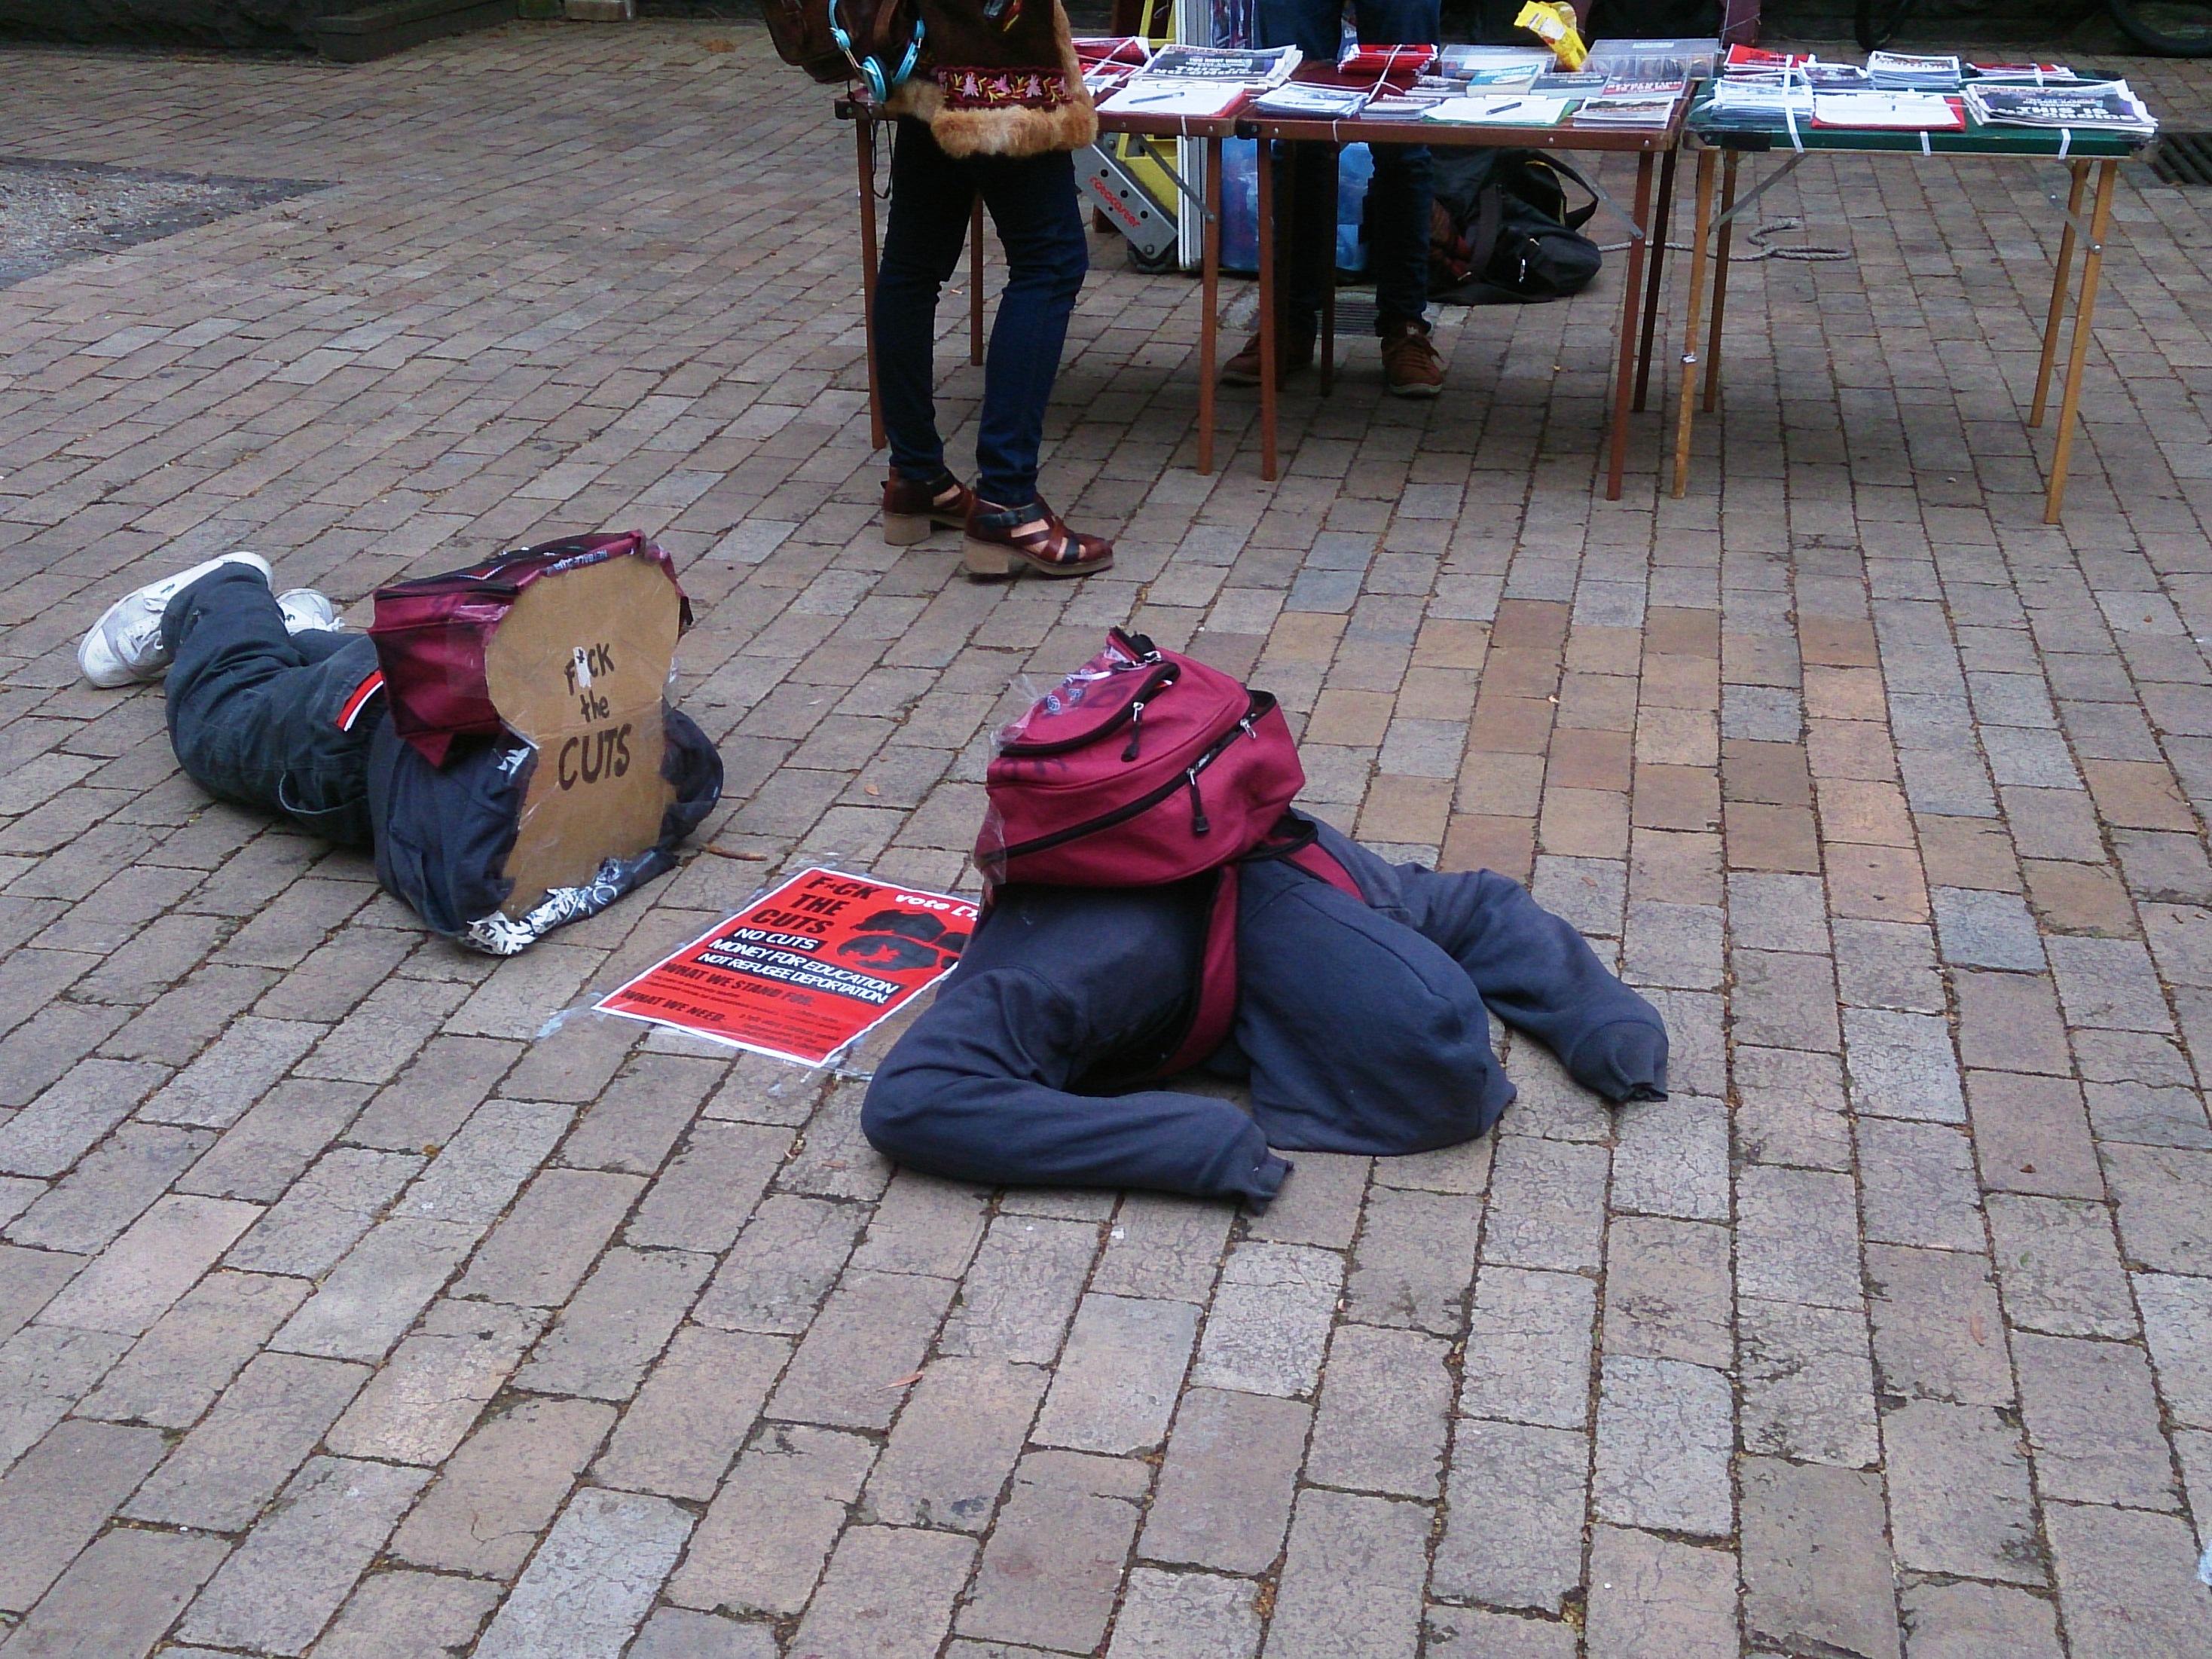 Univ. of Melbourne student protest